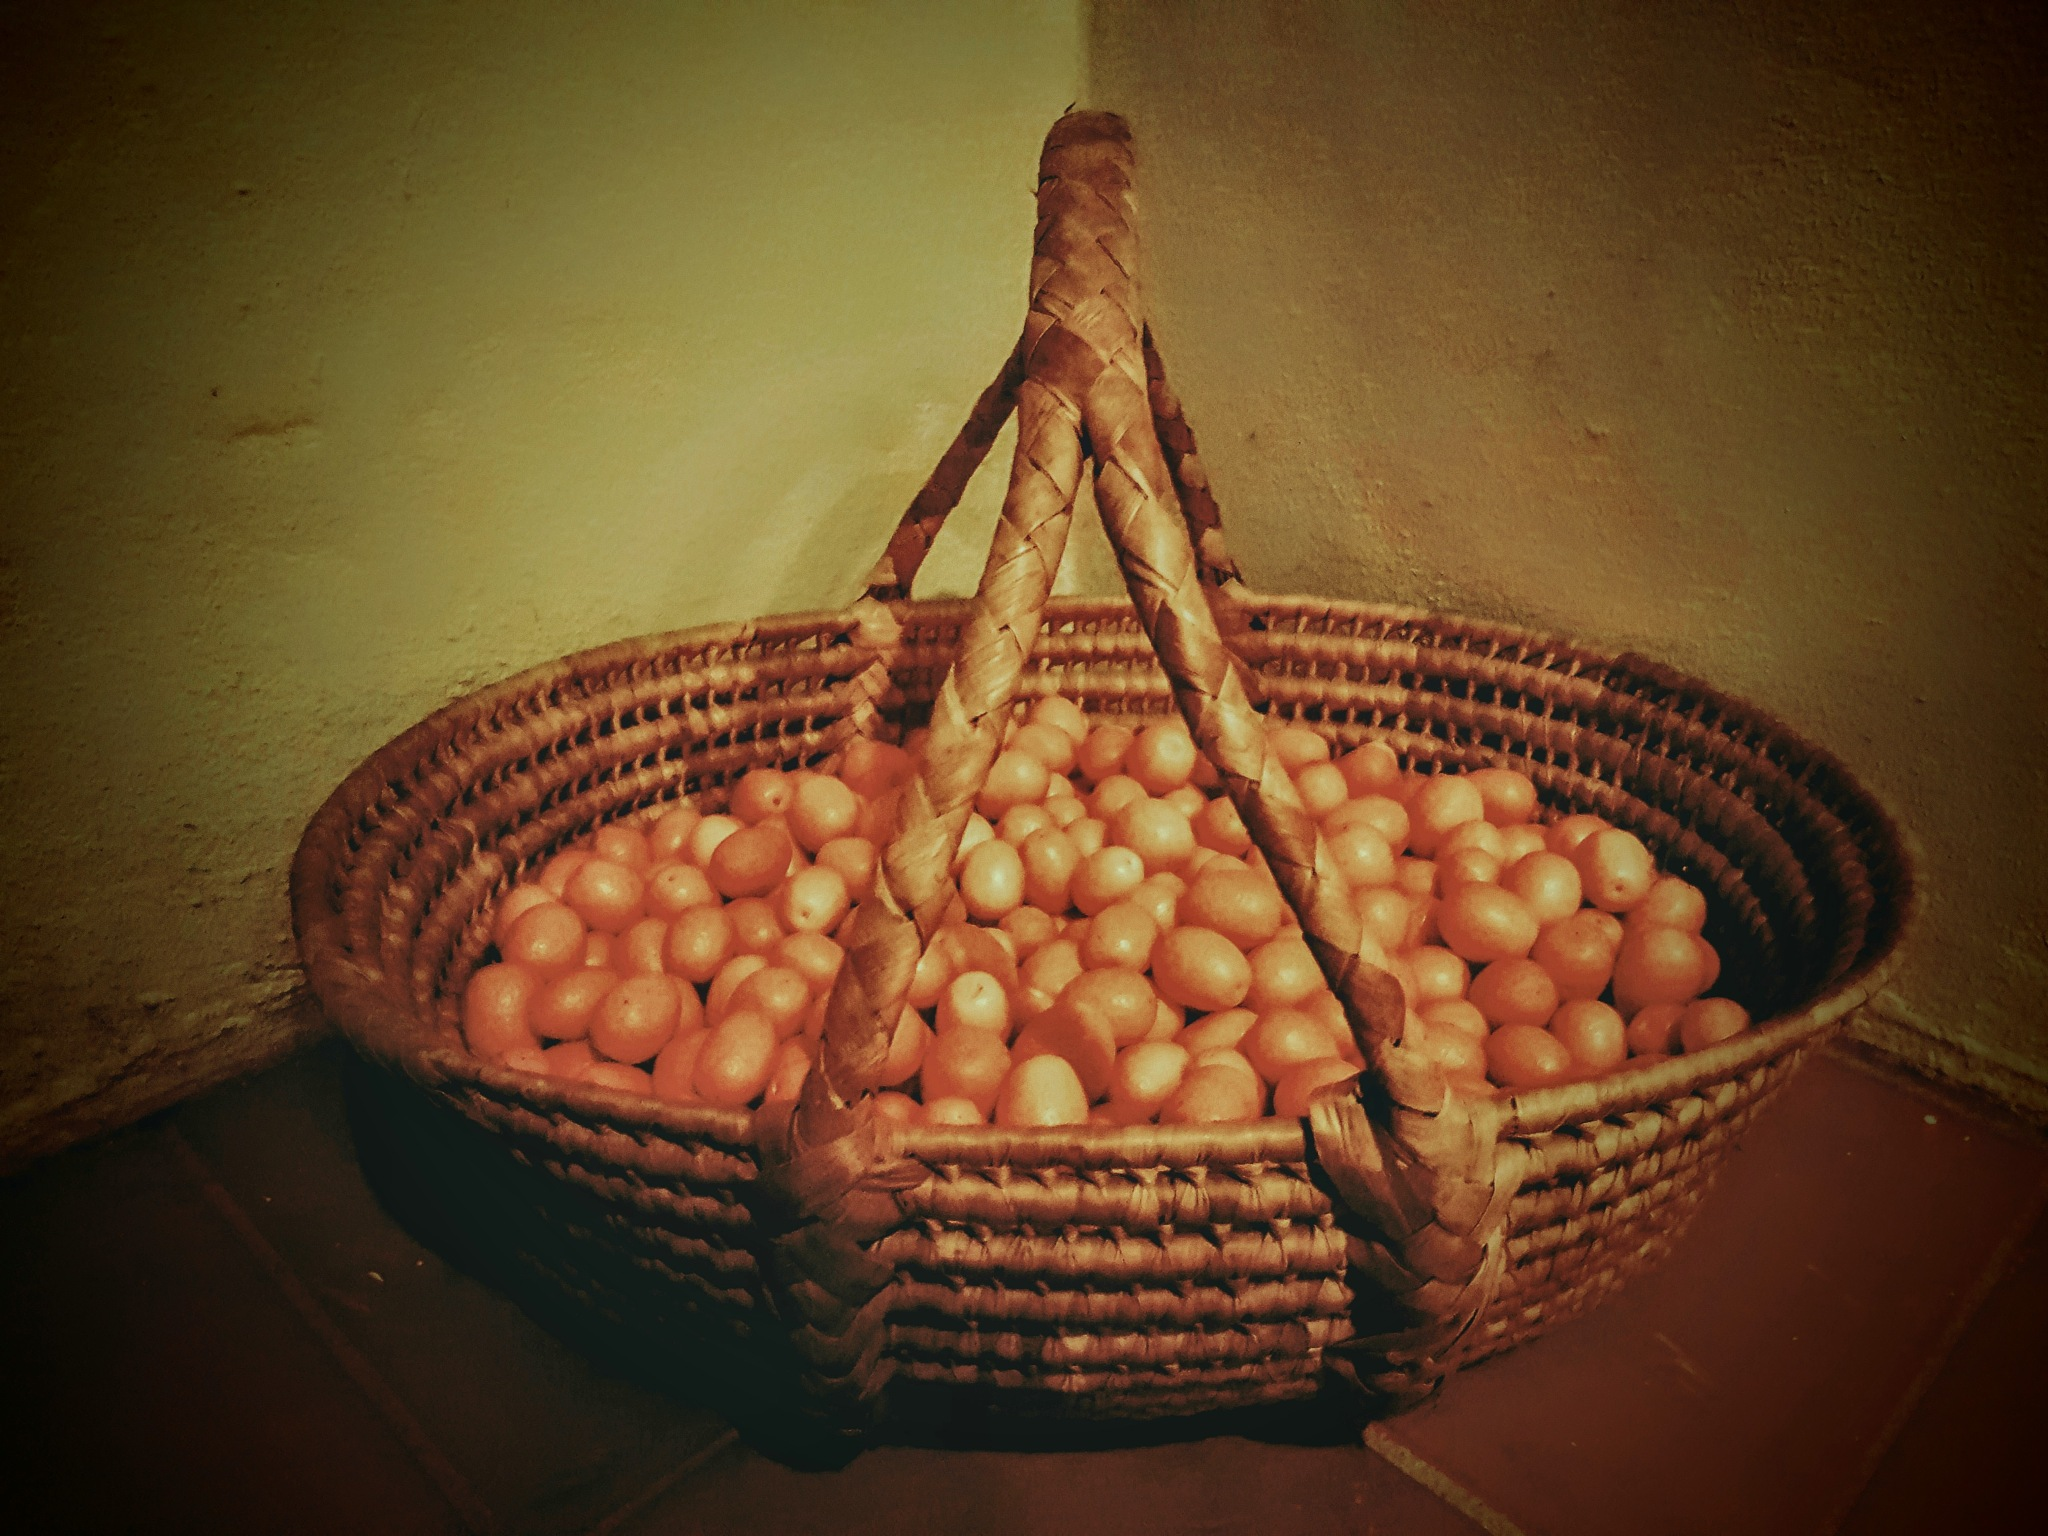 Cumquats picked ready to make jam by Amanda Savage